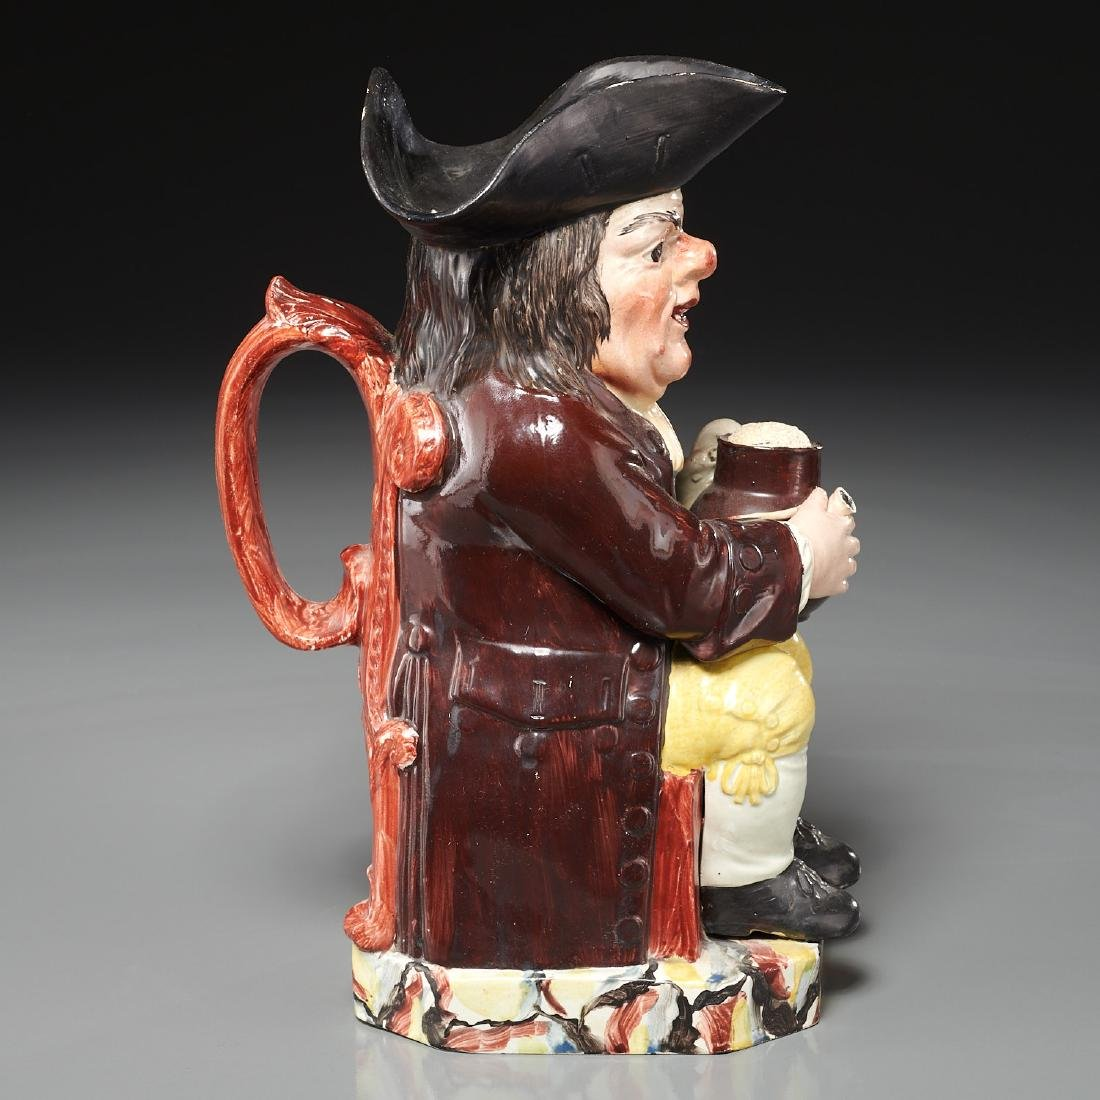 English pearlware Toby jug c. 1800s - 5